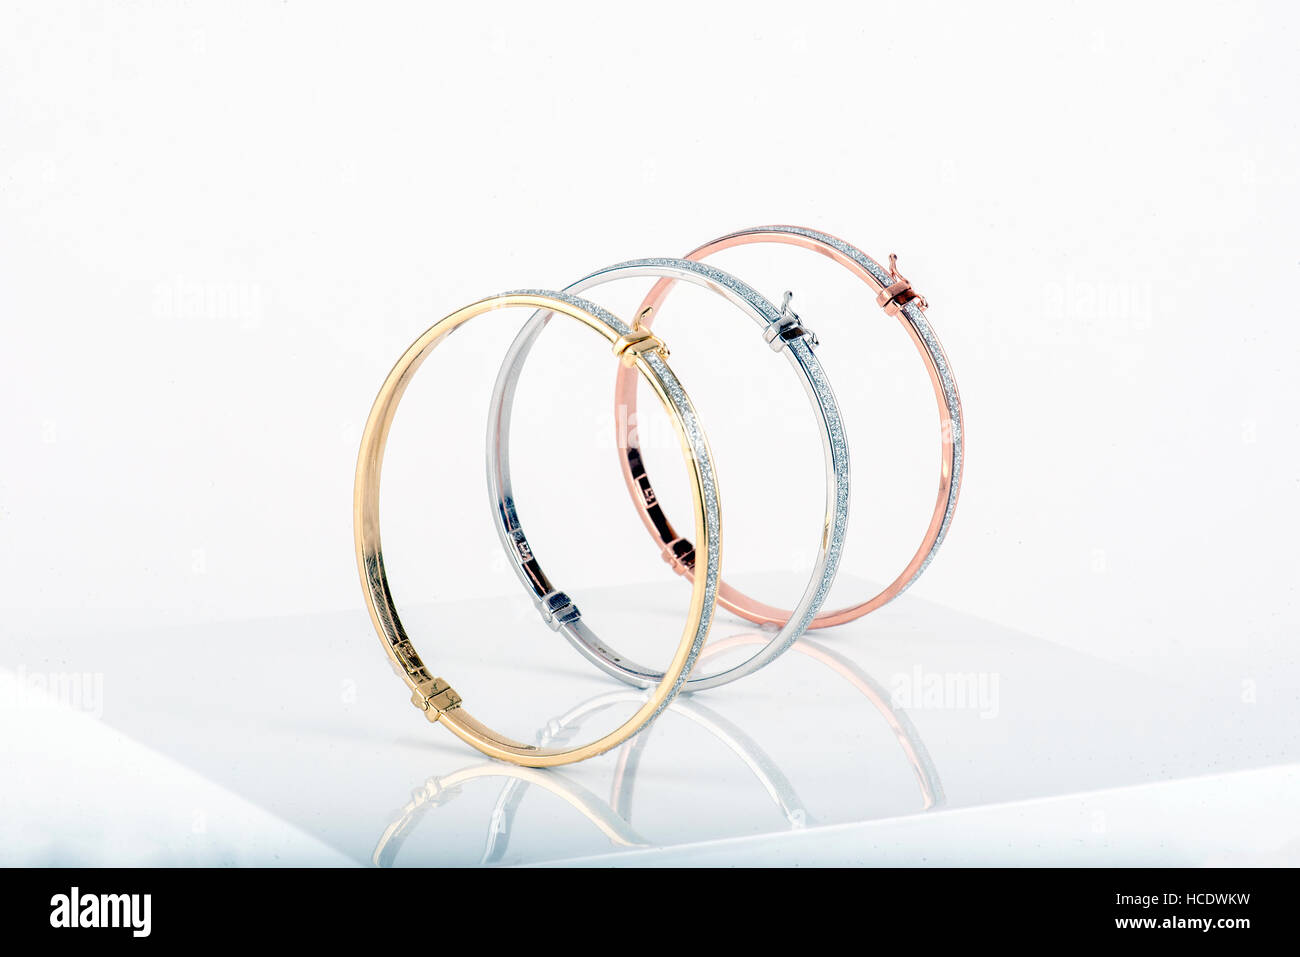 Expensive Jewellery Necklaces Pendants Bracelets Stones Earrings